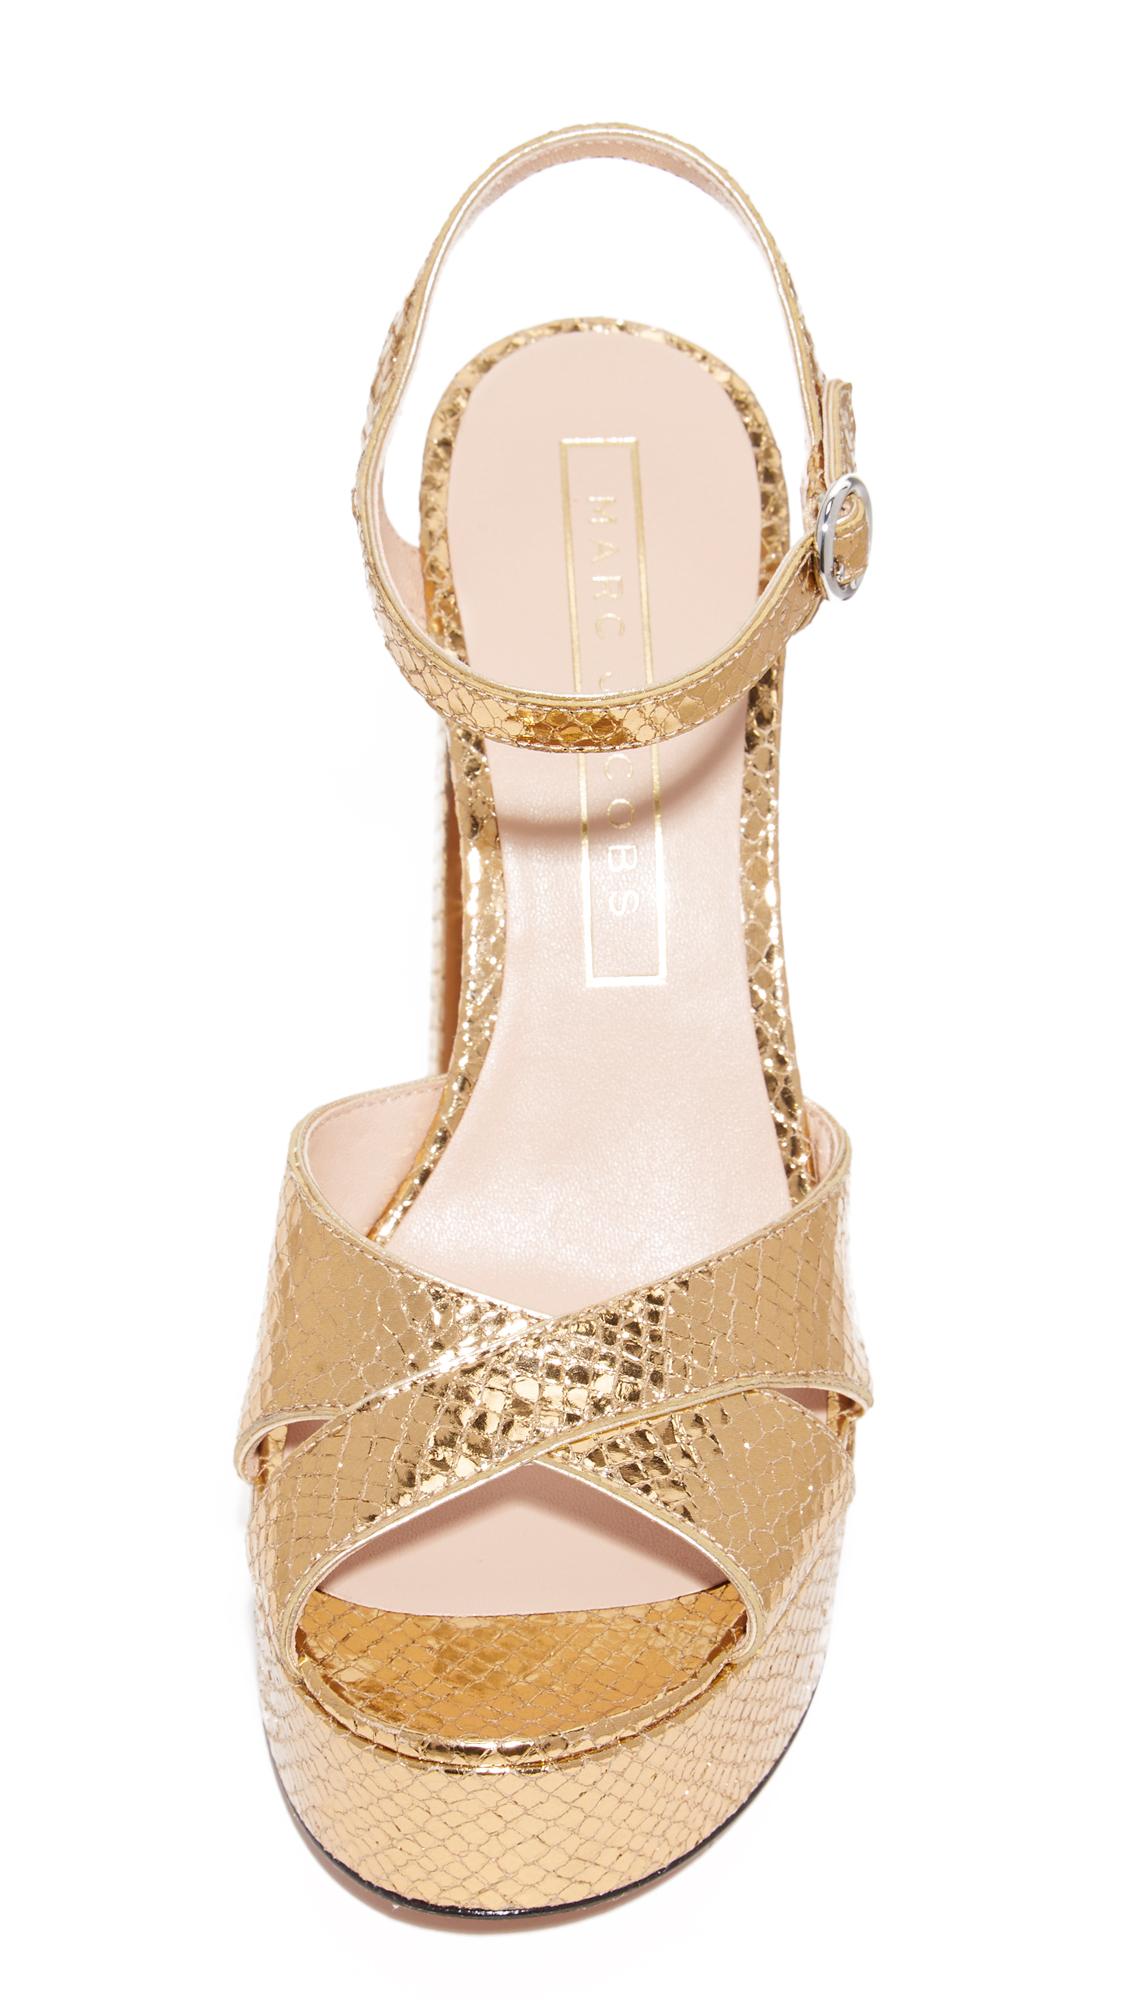 31fbefa8bddd Marc Jacobs Lust Platform Sandals